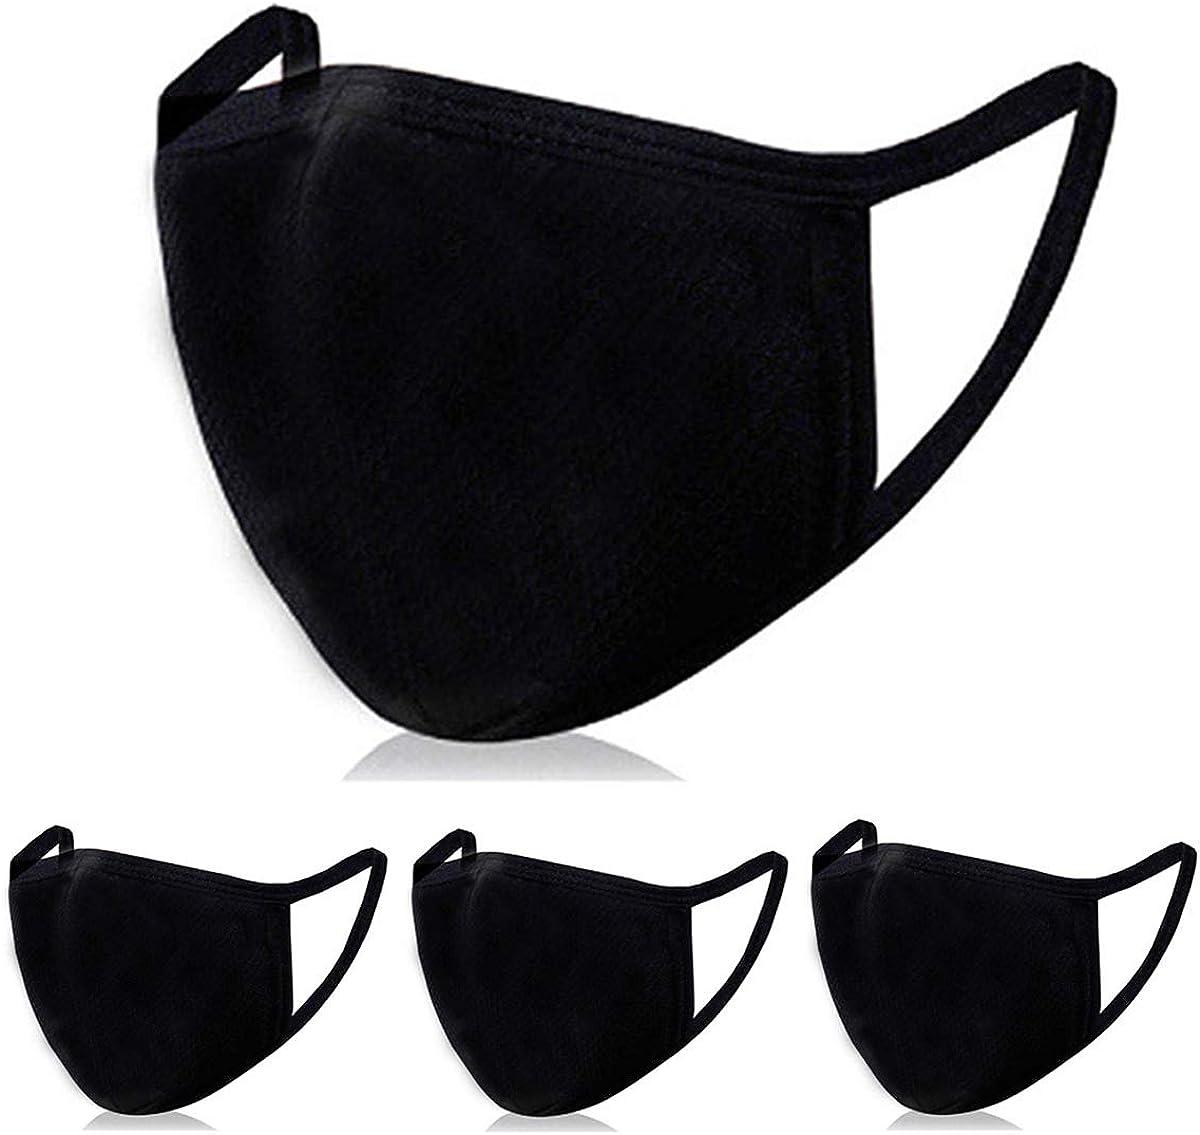 4 PCS Fashion Protective, Unisex Black Dust Cotton Mask with Filter Pocket, 100% Organic Cotton Fabric